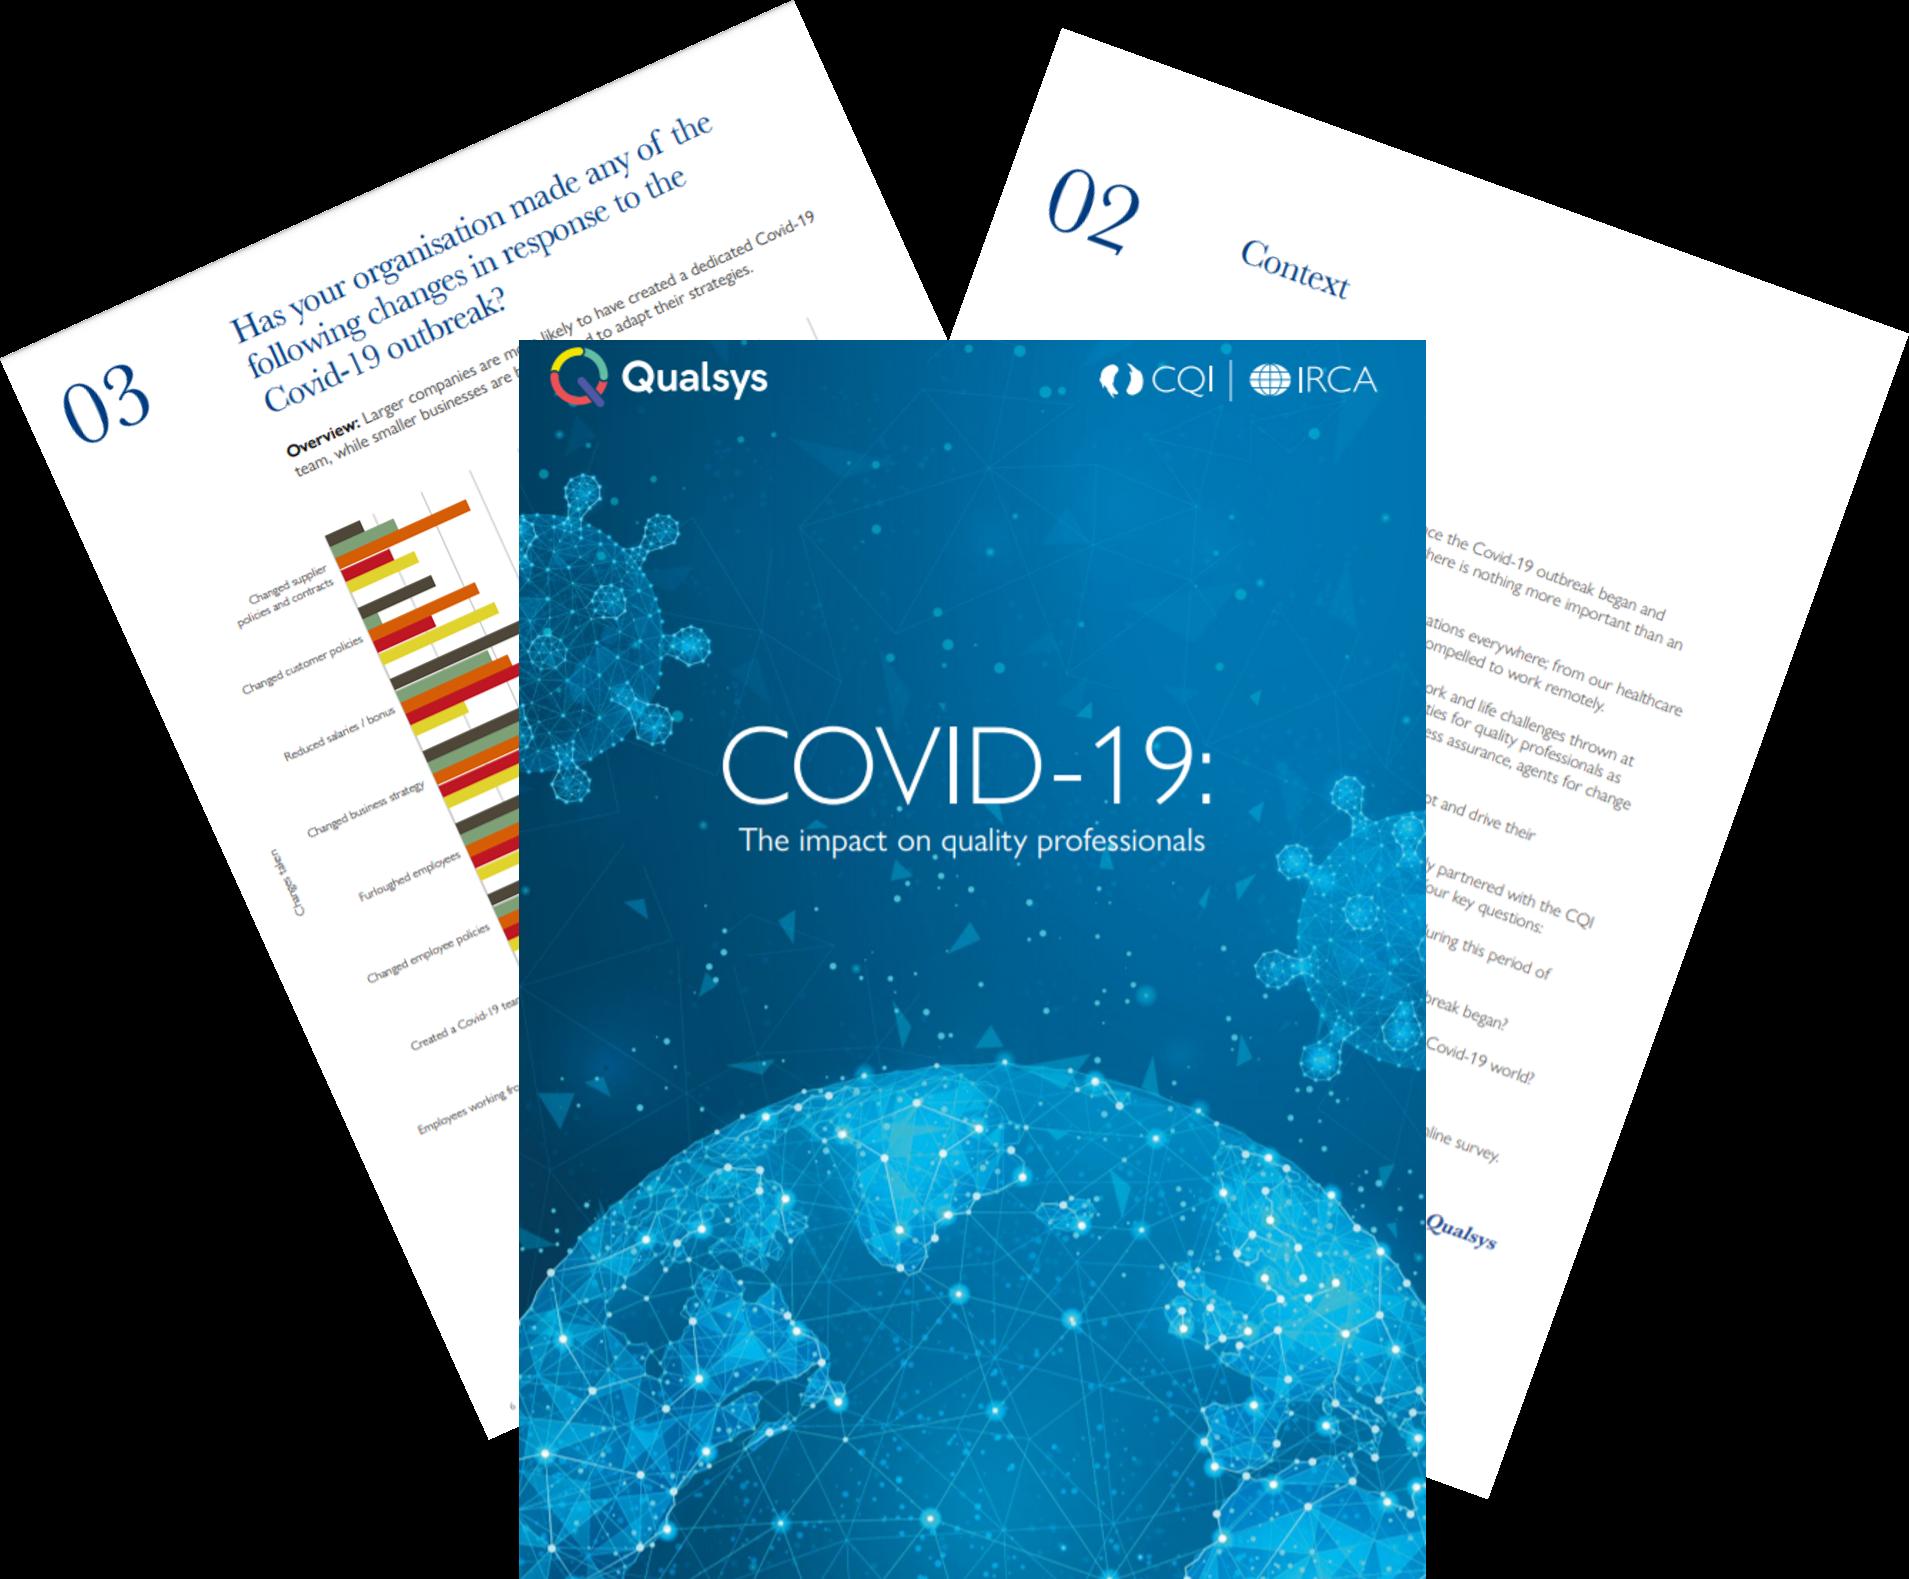 COVID 19 quality profession report